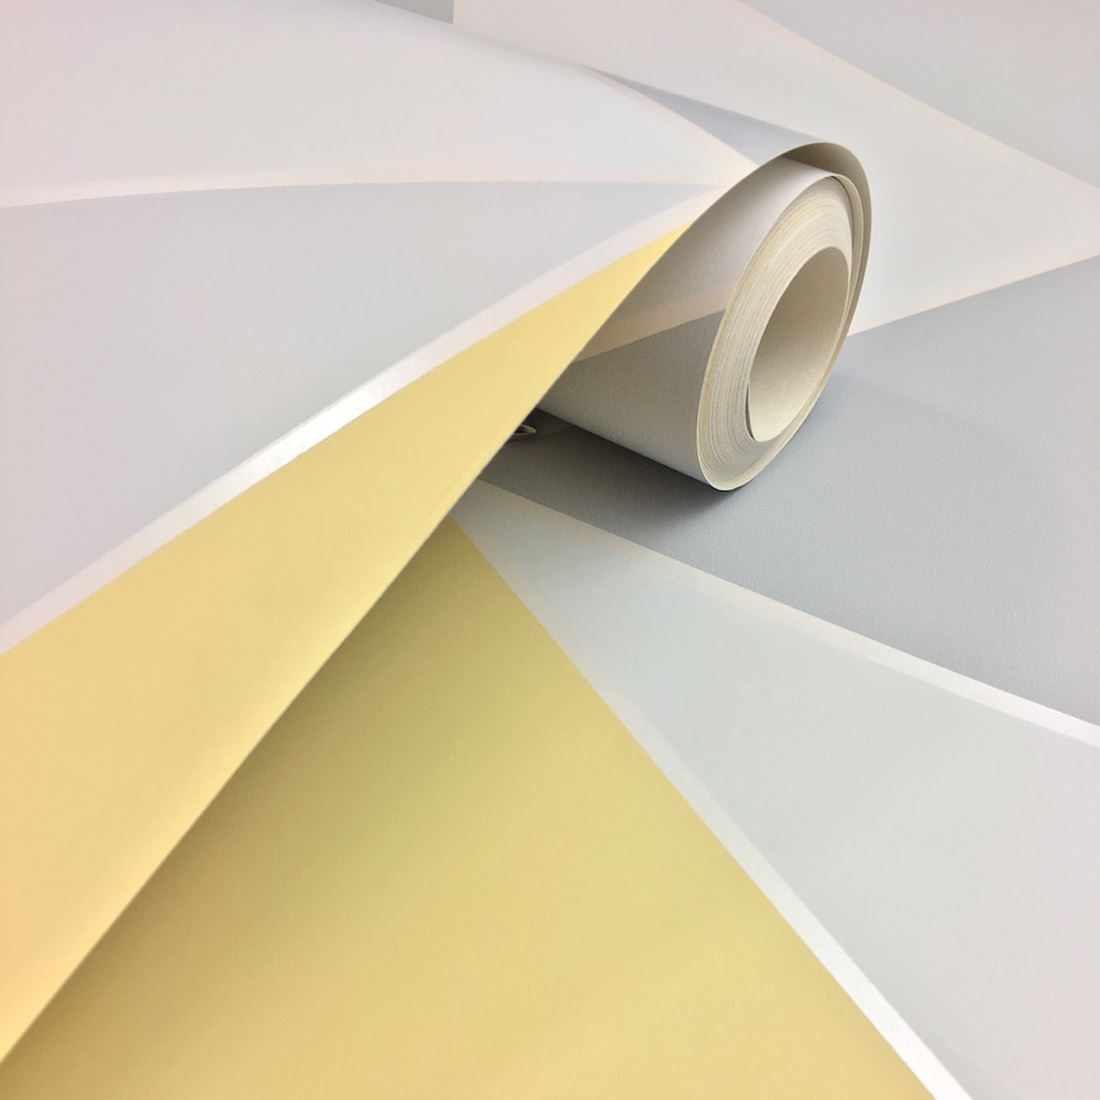 miniatura 18 - Carta da Parati Geometrica Arredamento Camera Moderno Vari Disegni e Colori